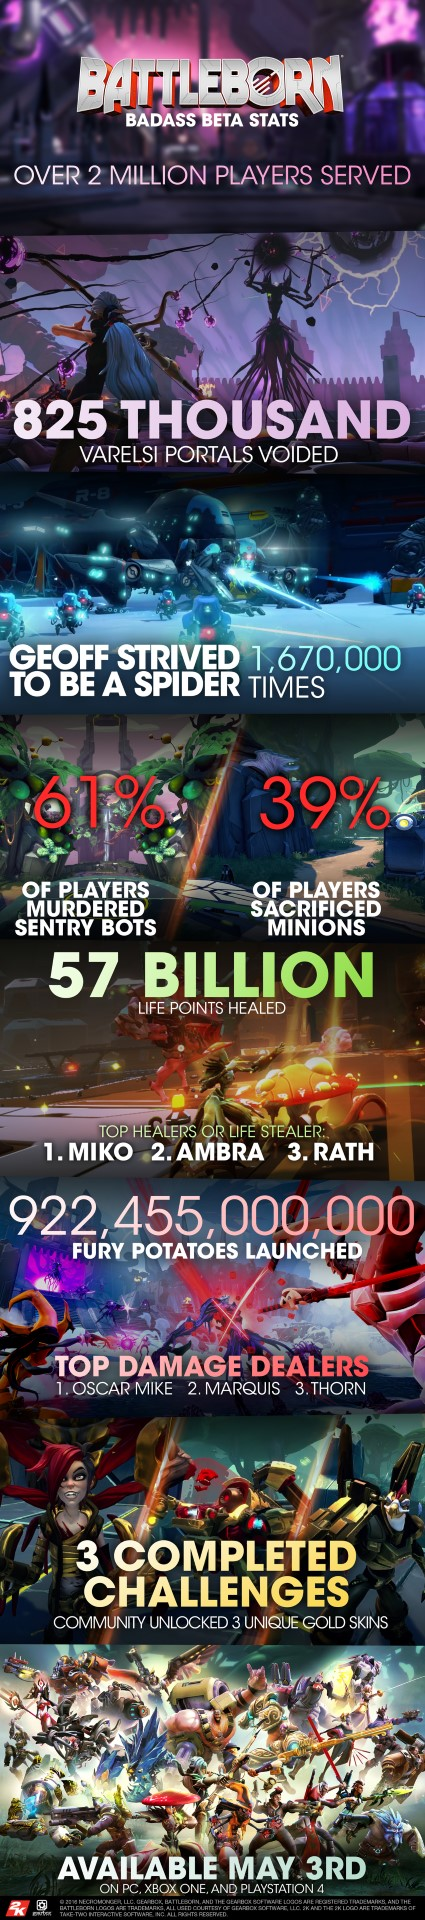 2K_Battleborn_Beta_Infographic